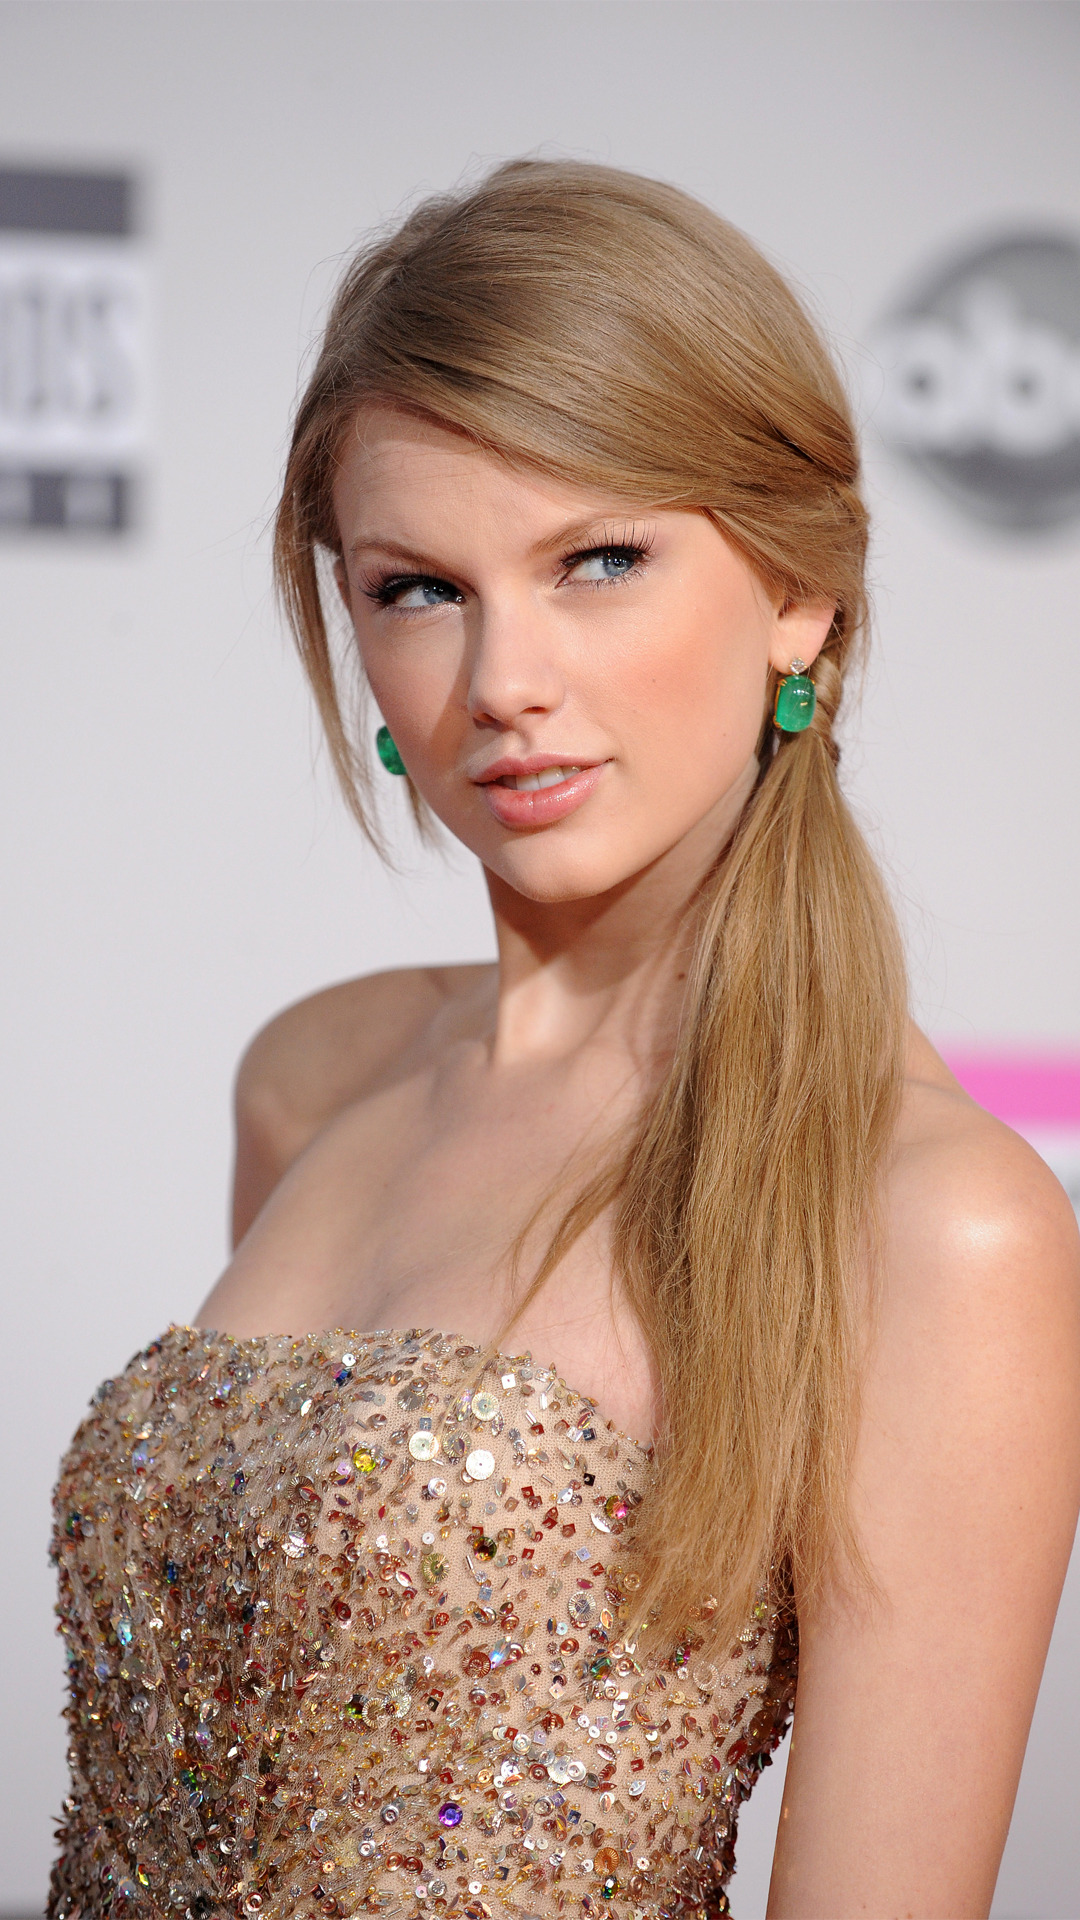 Taylor Swift htc one wallpaper - Best htc one wallpapers